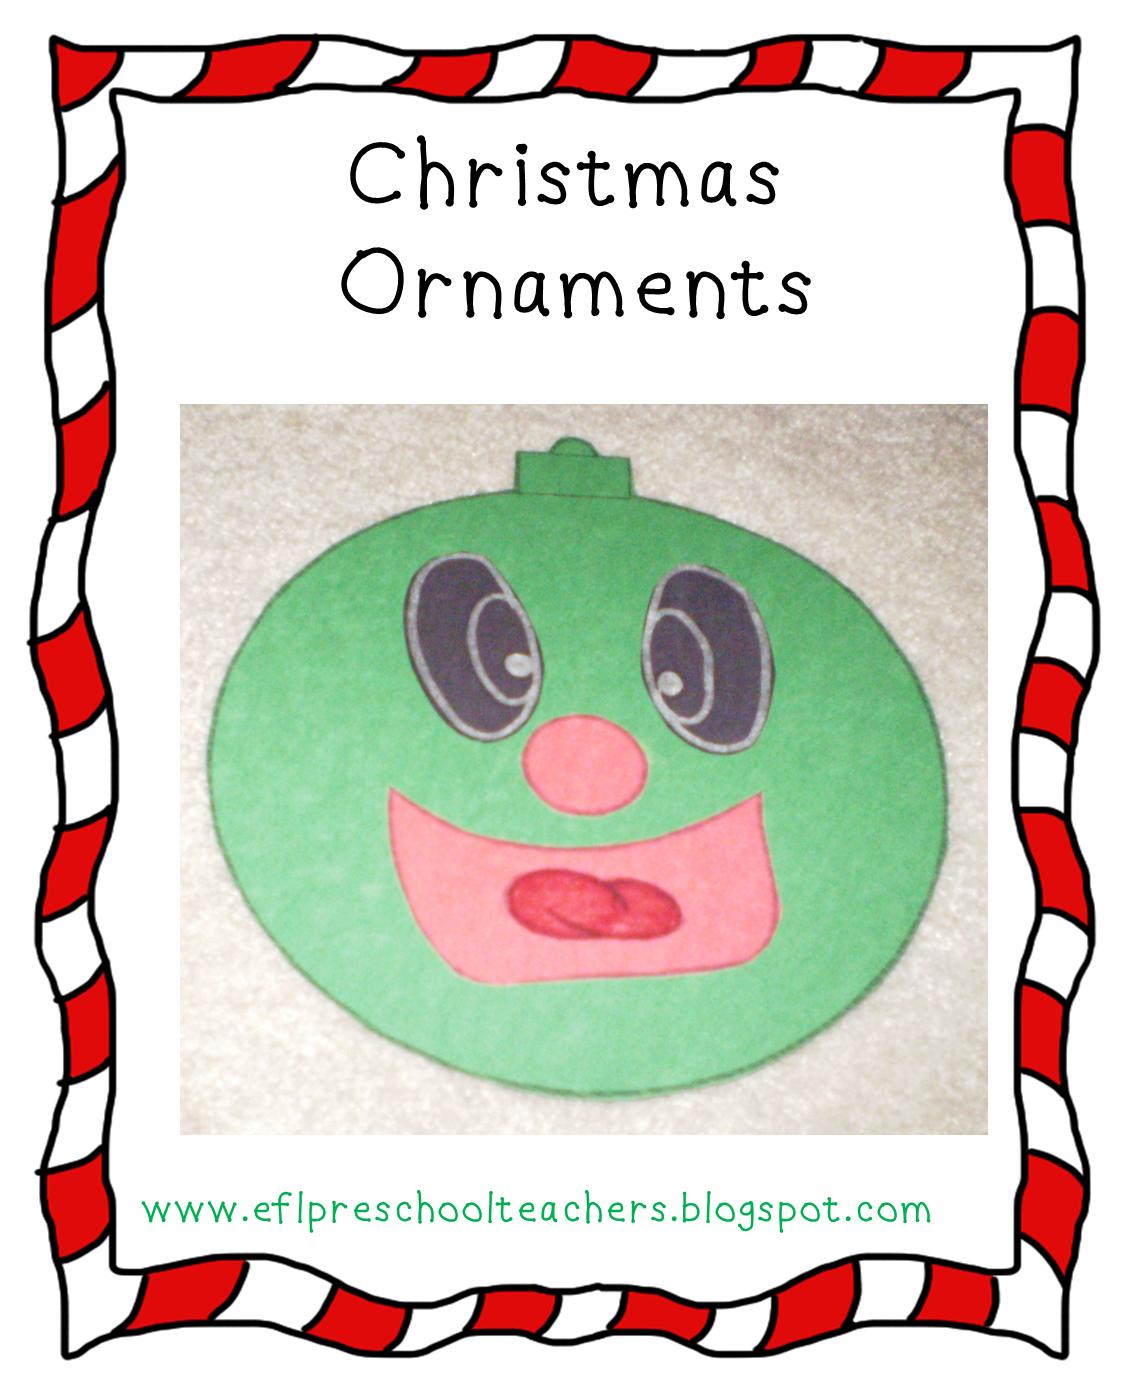 Esl Efl Preschool Teachers Christmas